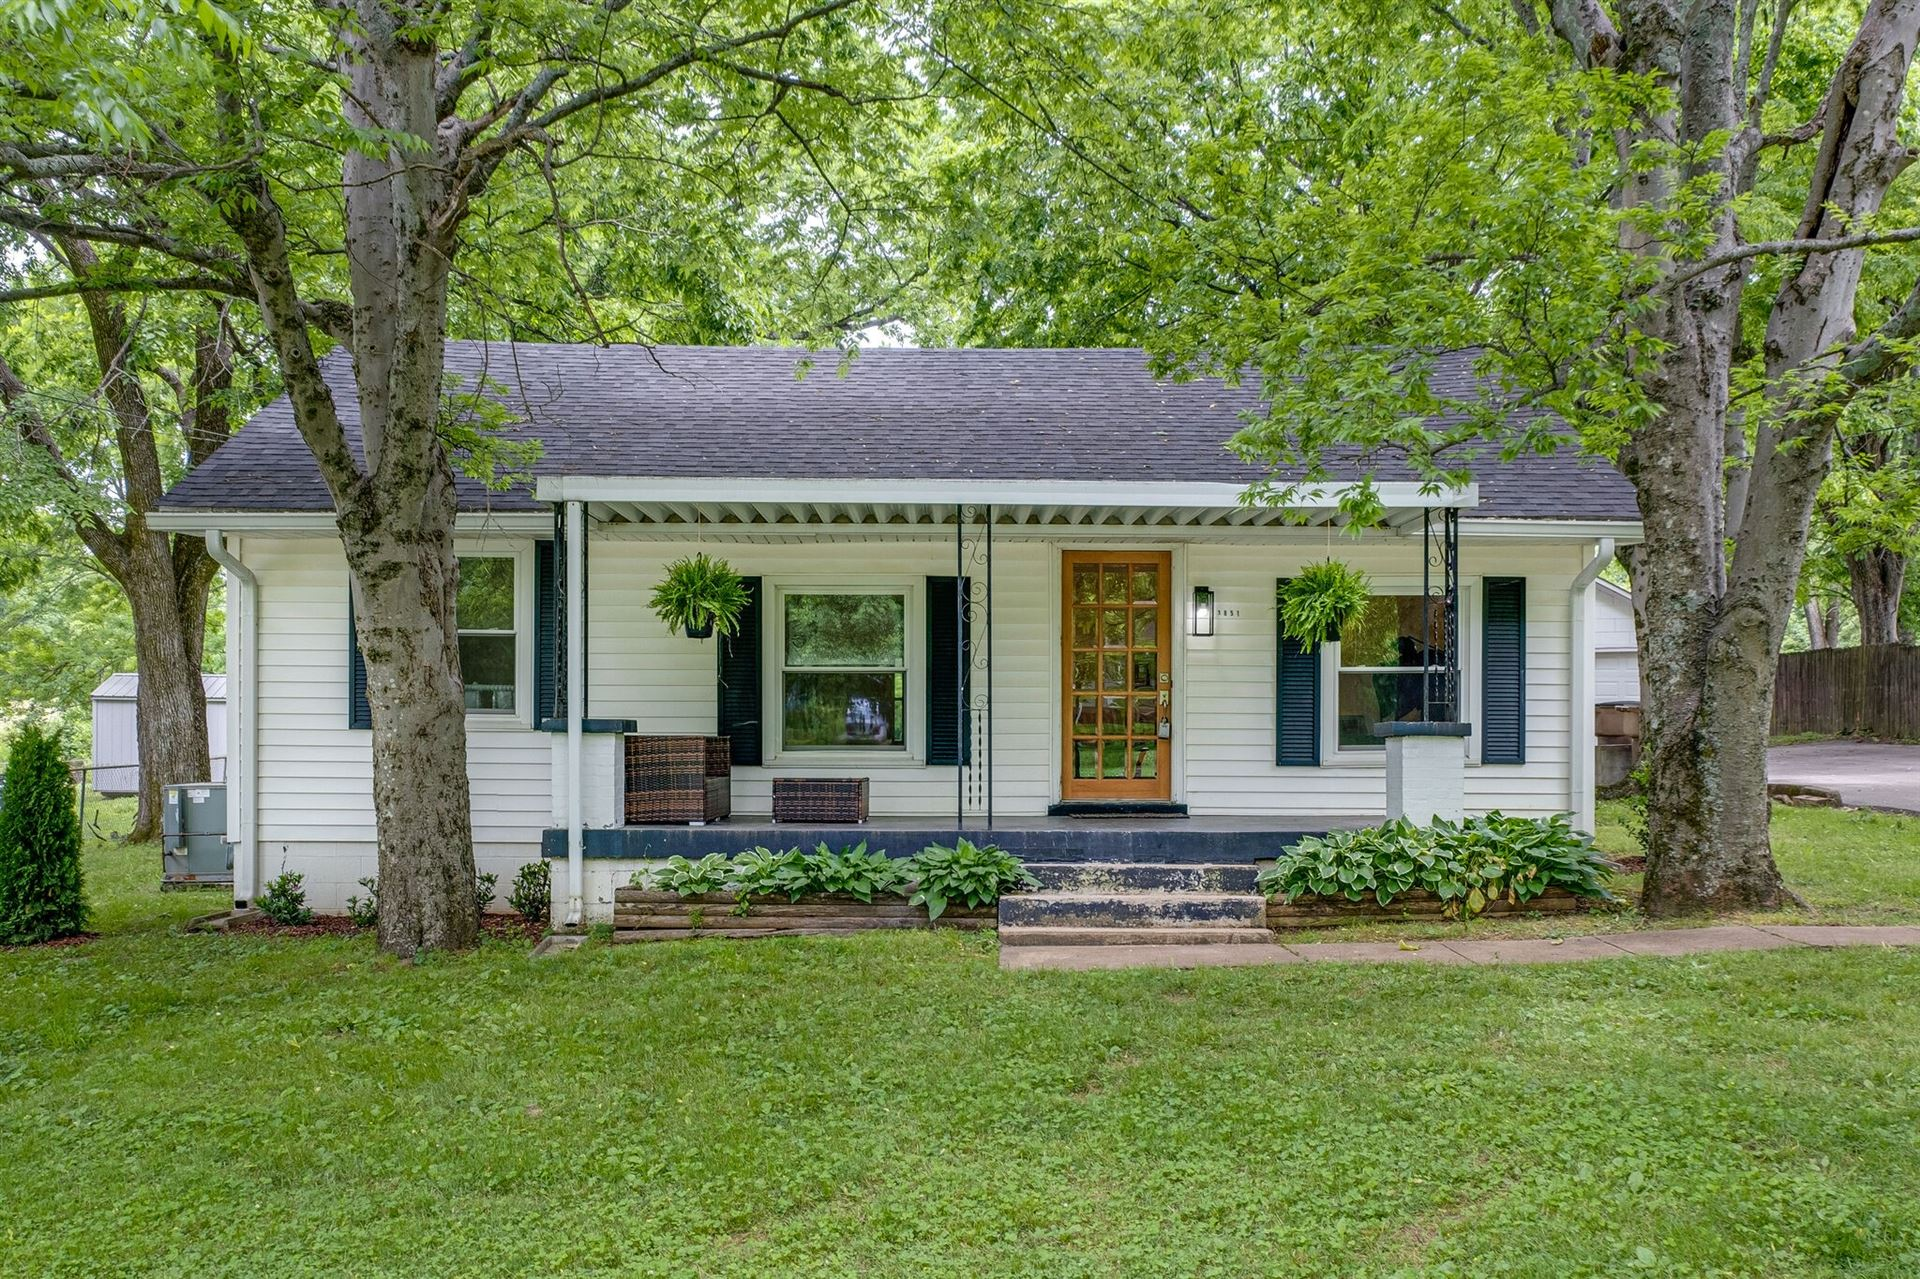 3851 Saunders Ave, Nashville, TN 37216 - MLS#: 2254742